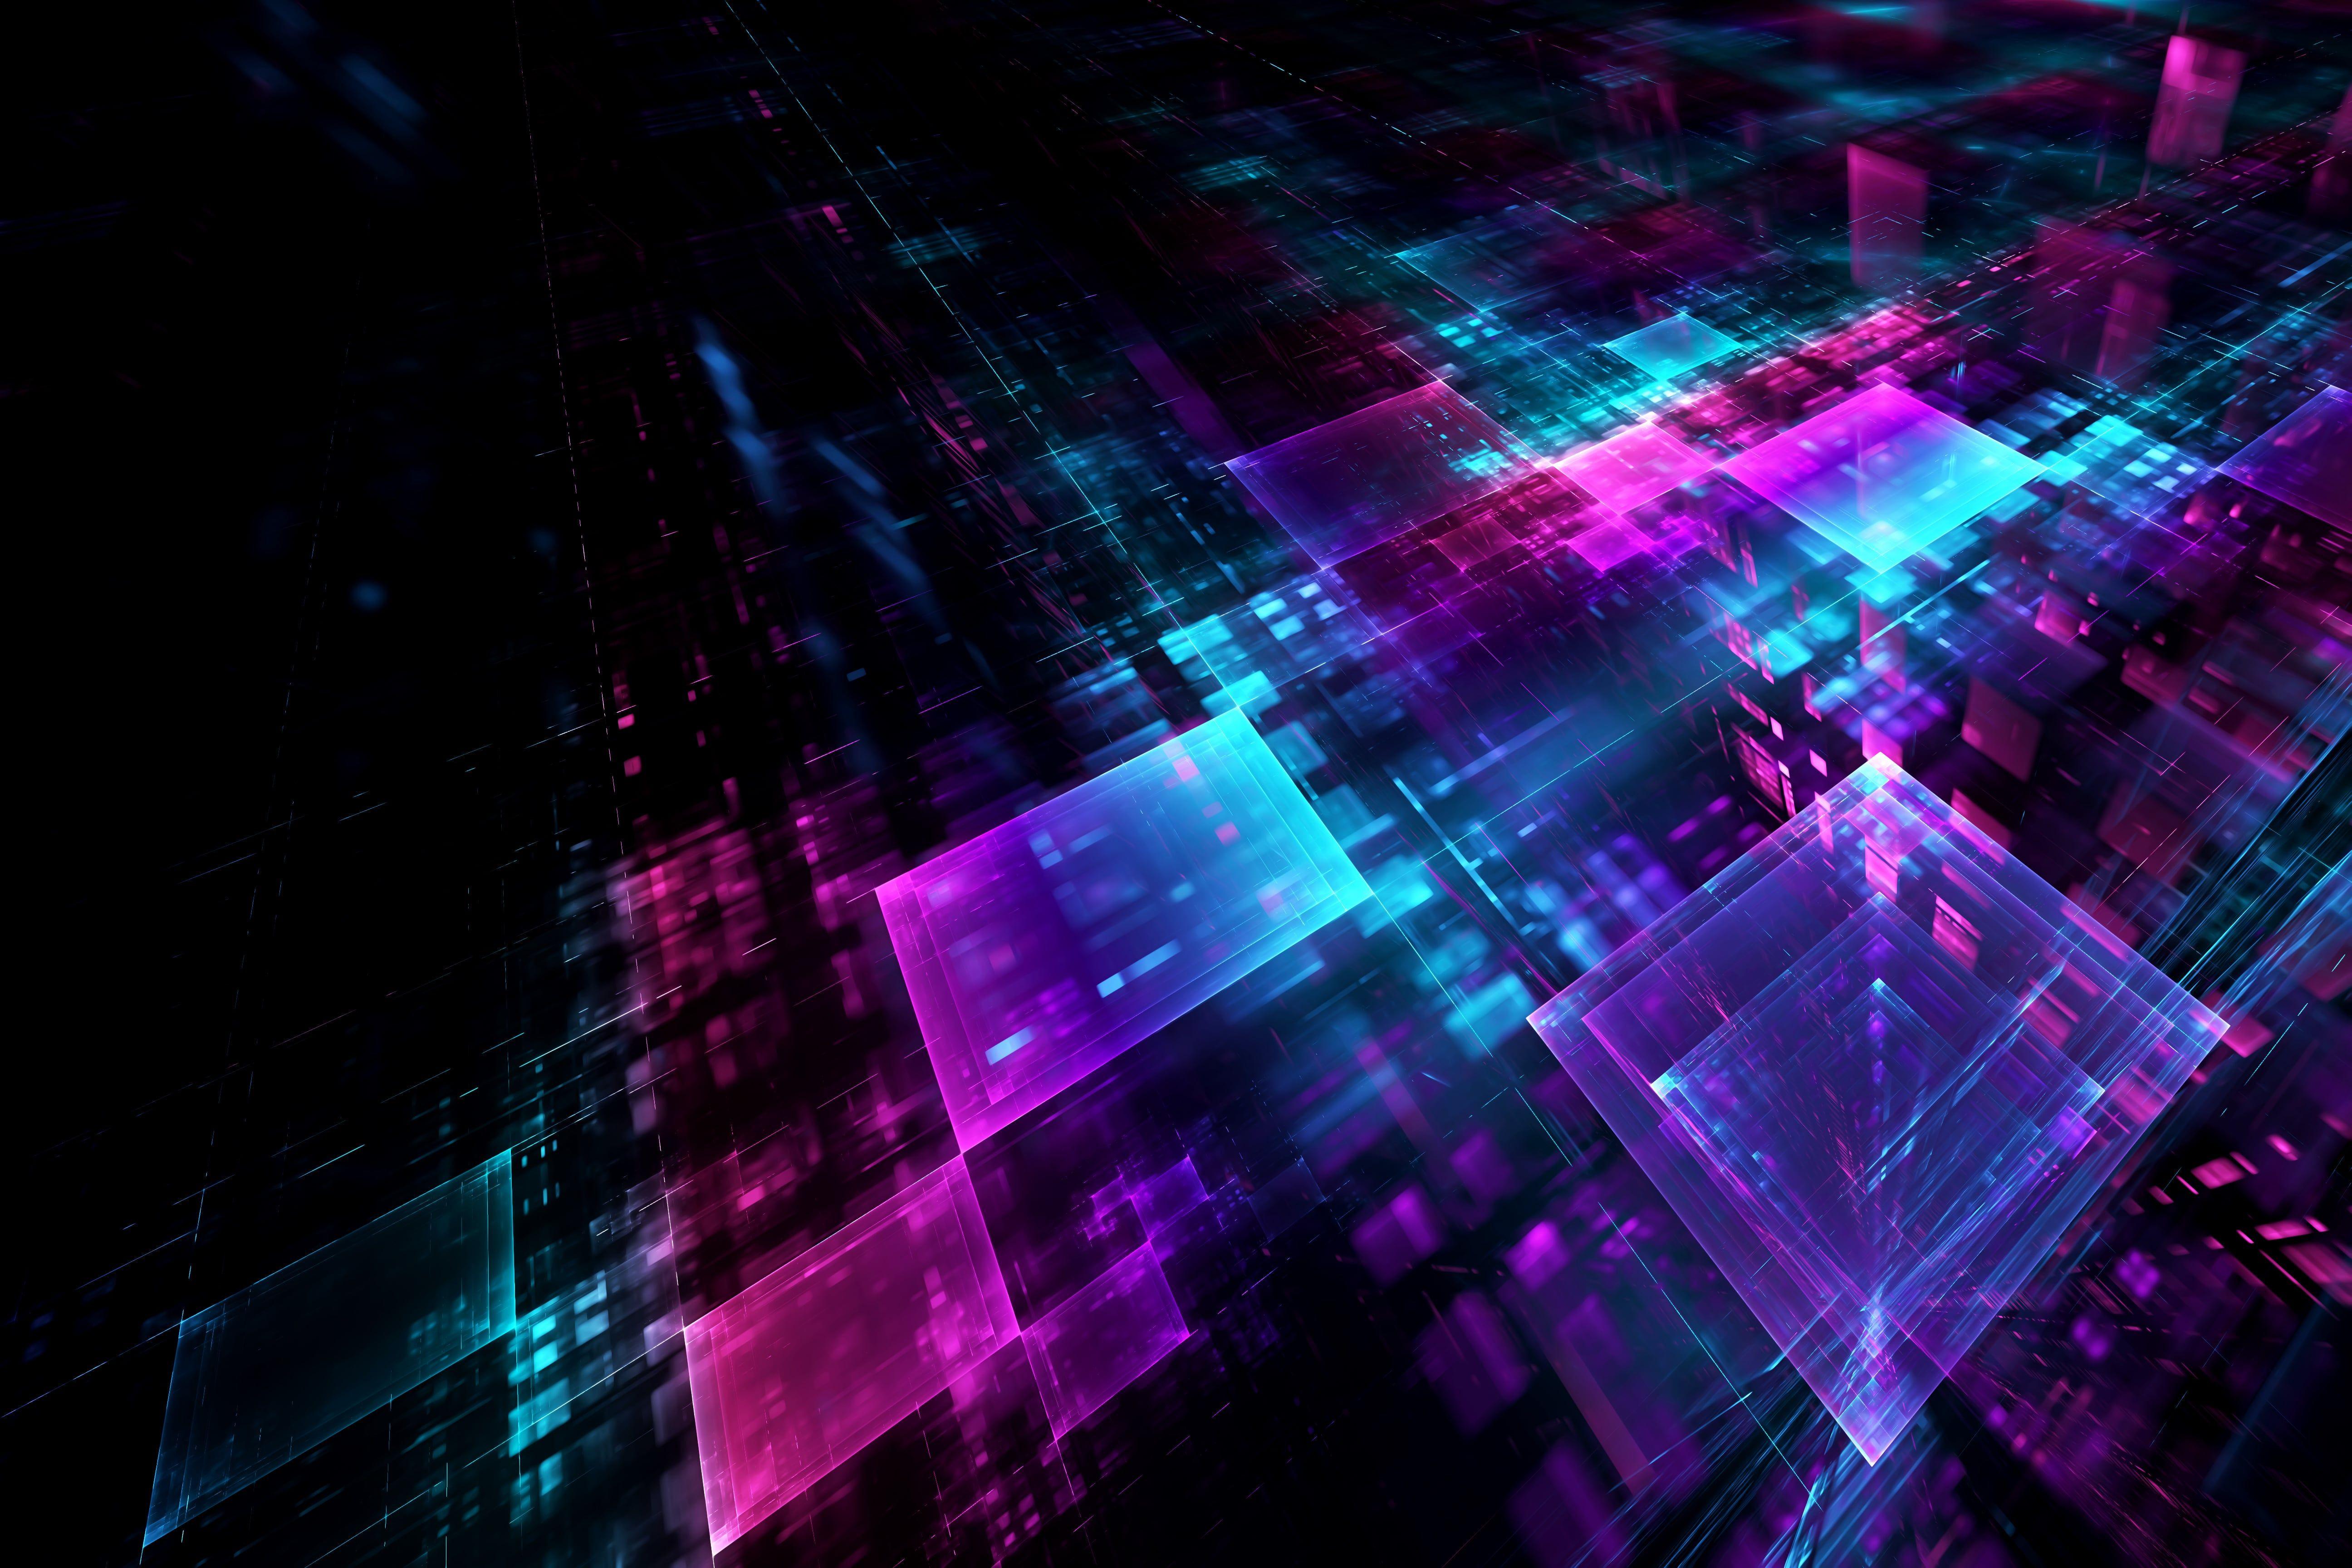 Desktophdwallpaper Org Geometri Abstrak Neon